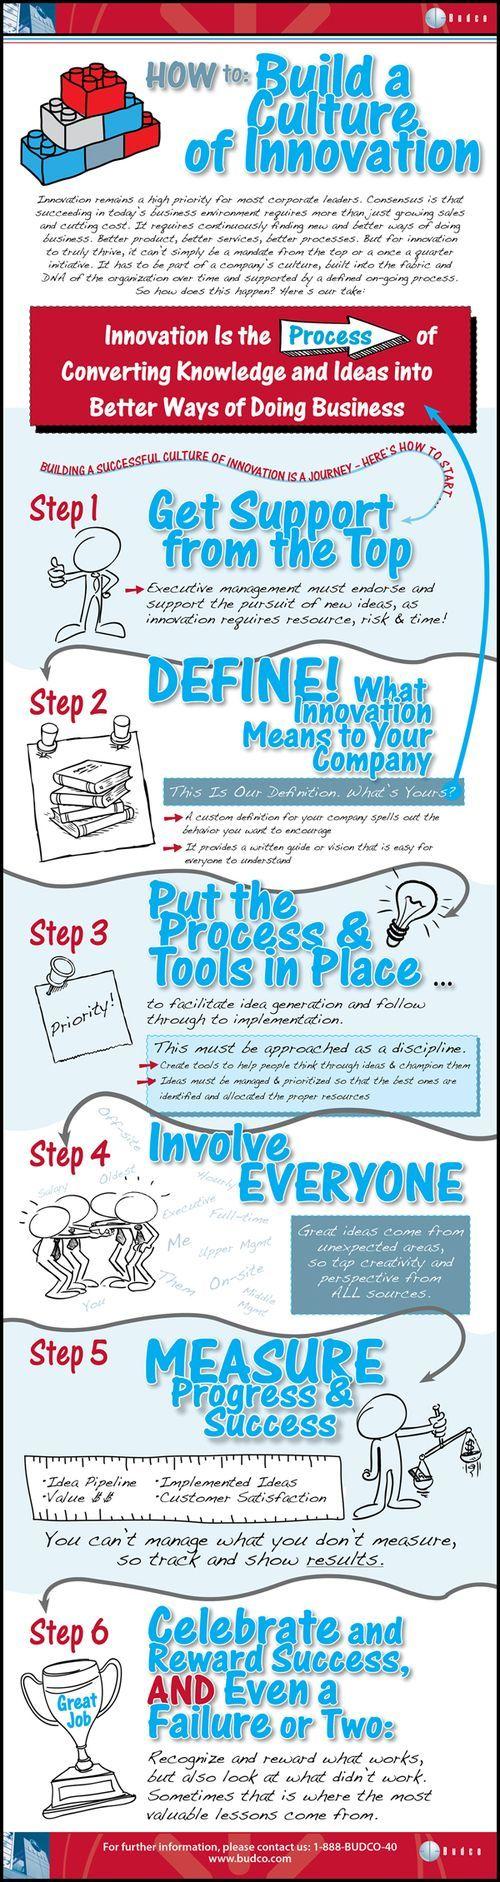 #Entrepreneurship: Building a Culture of Innovation!